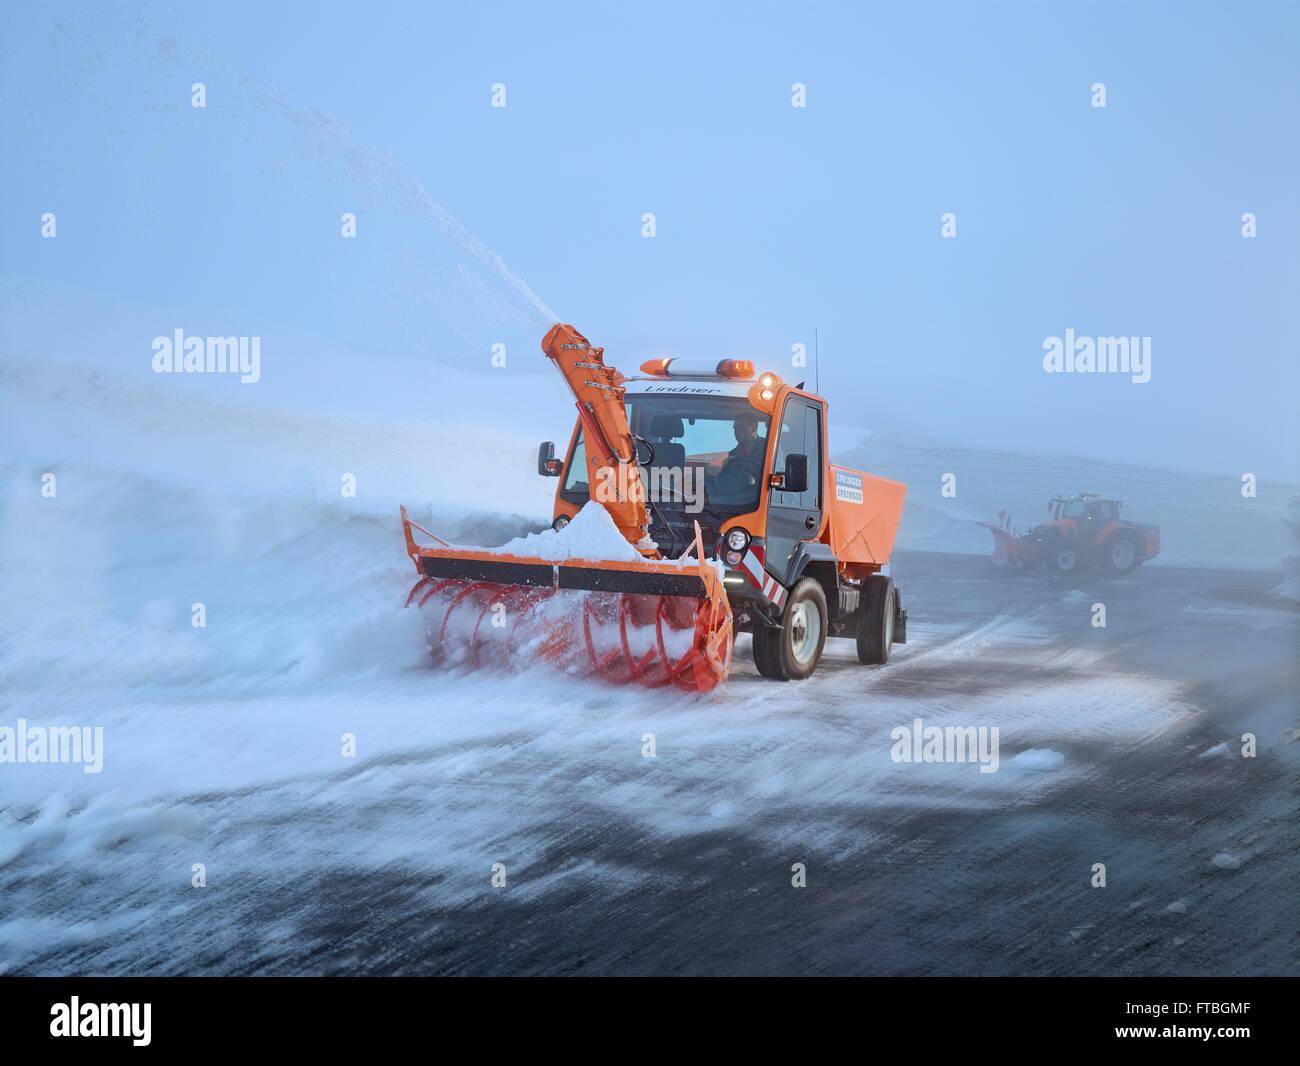 Snowplow with snowblower for winter maintenance, Hochgurgl, Ötztal, Tyrol, Austria - Stock Image